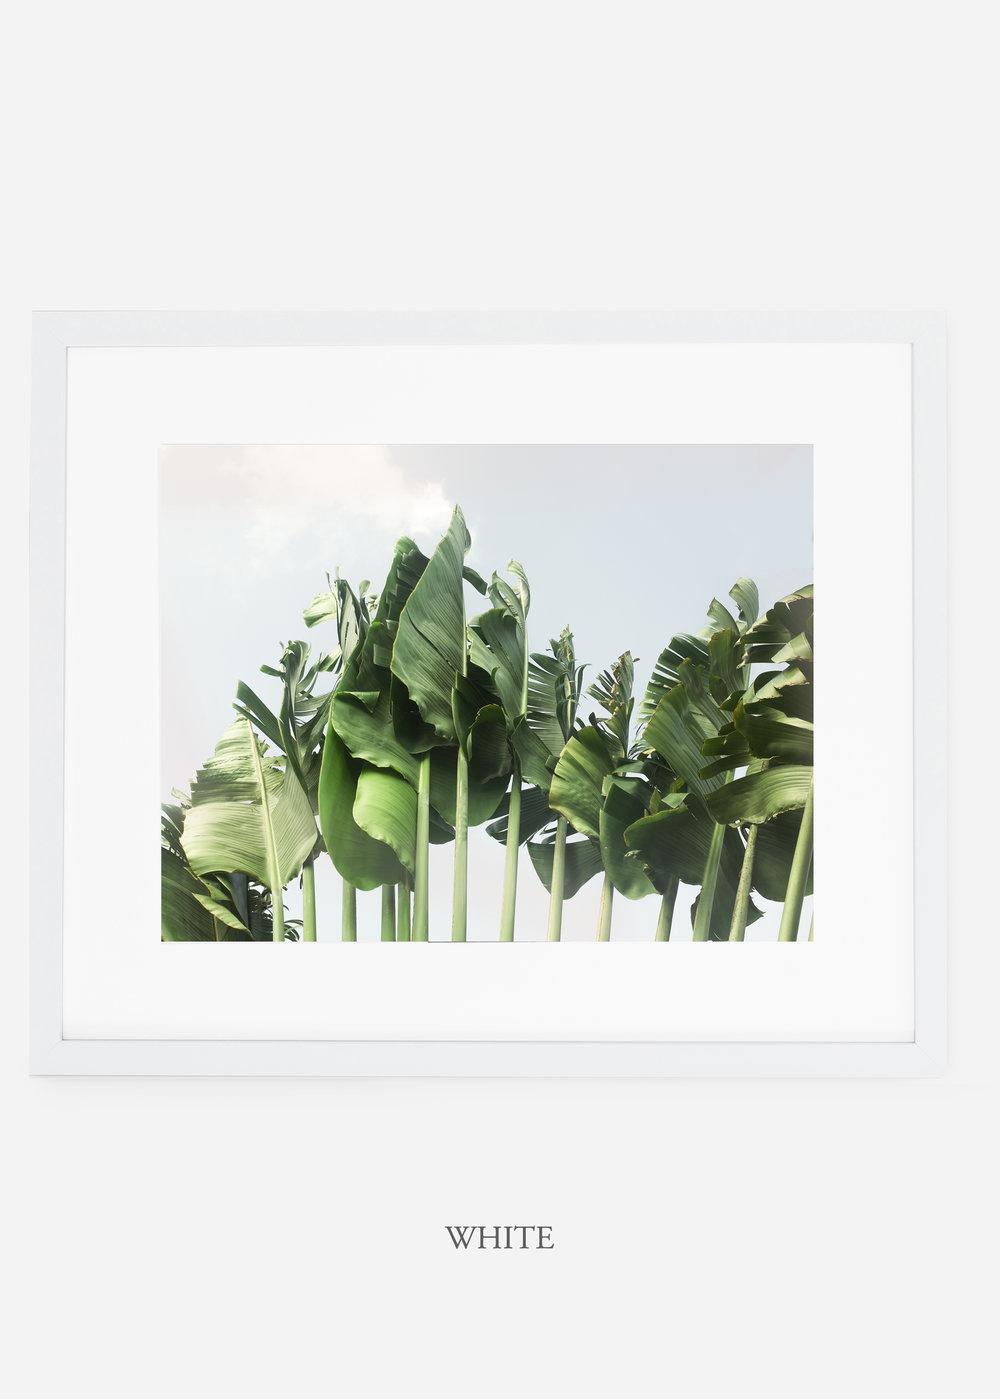 wildercalifornia_whiteframe_tulum_bananaleaf_No.1_minimal_cactus_art_interiordesign_blackandwhite.jpg